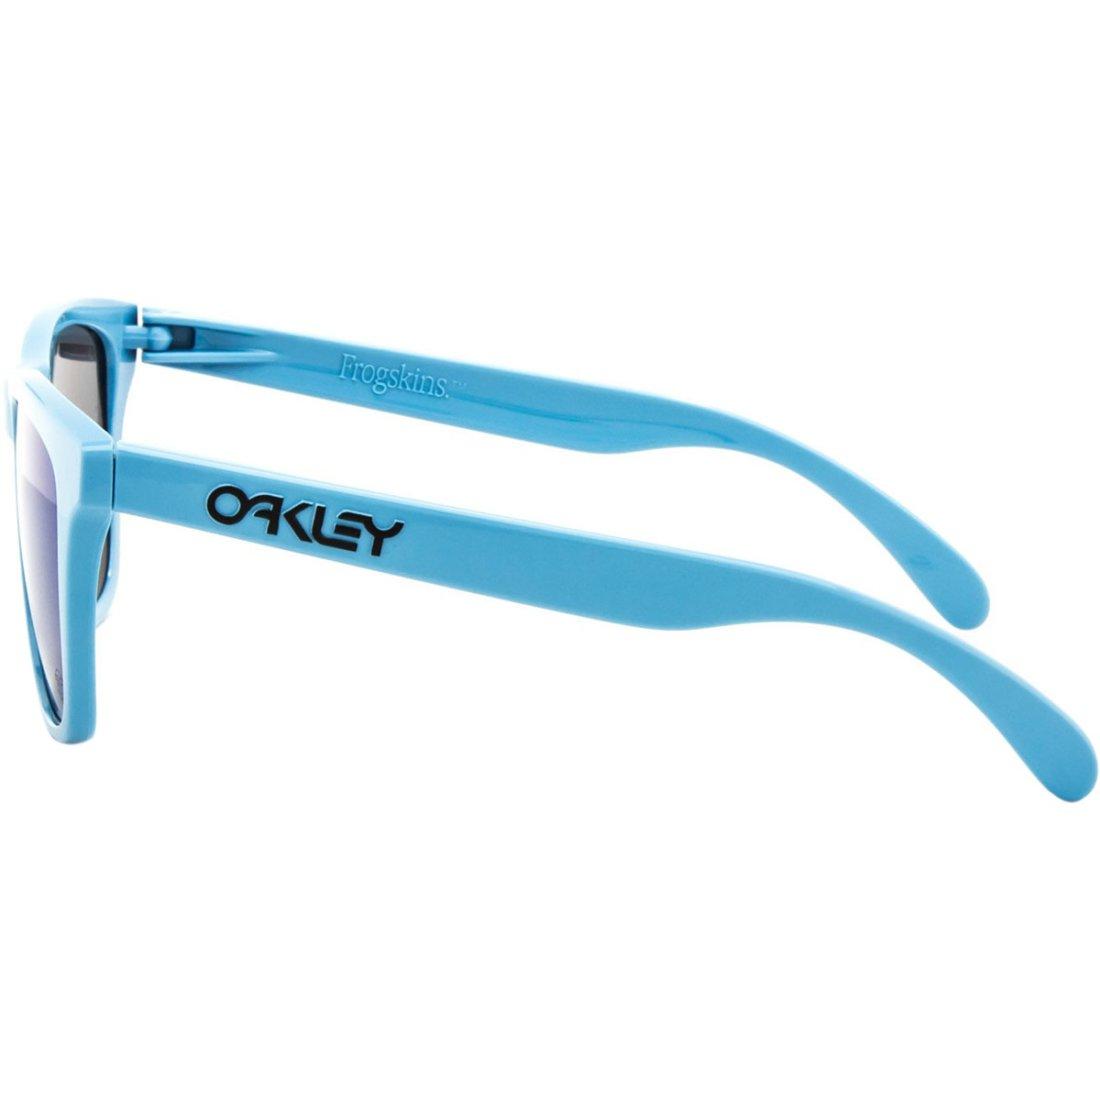 9bf3c6c185 Gafas de sol OAKLEY Frogskins Heritage Collection Polished Blue / Ice  Iridium